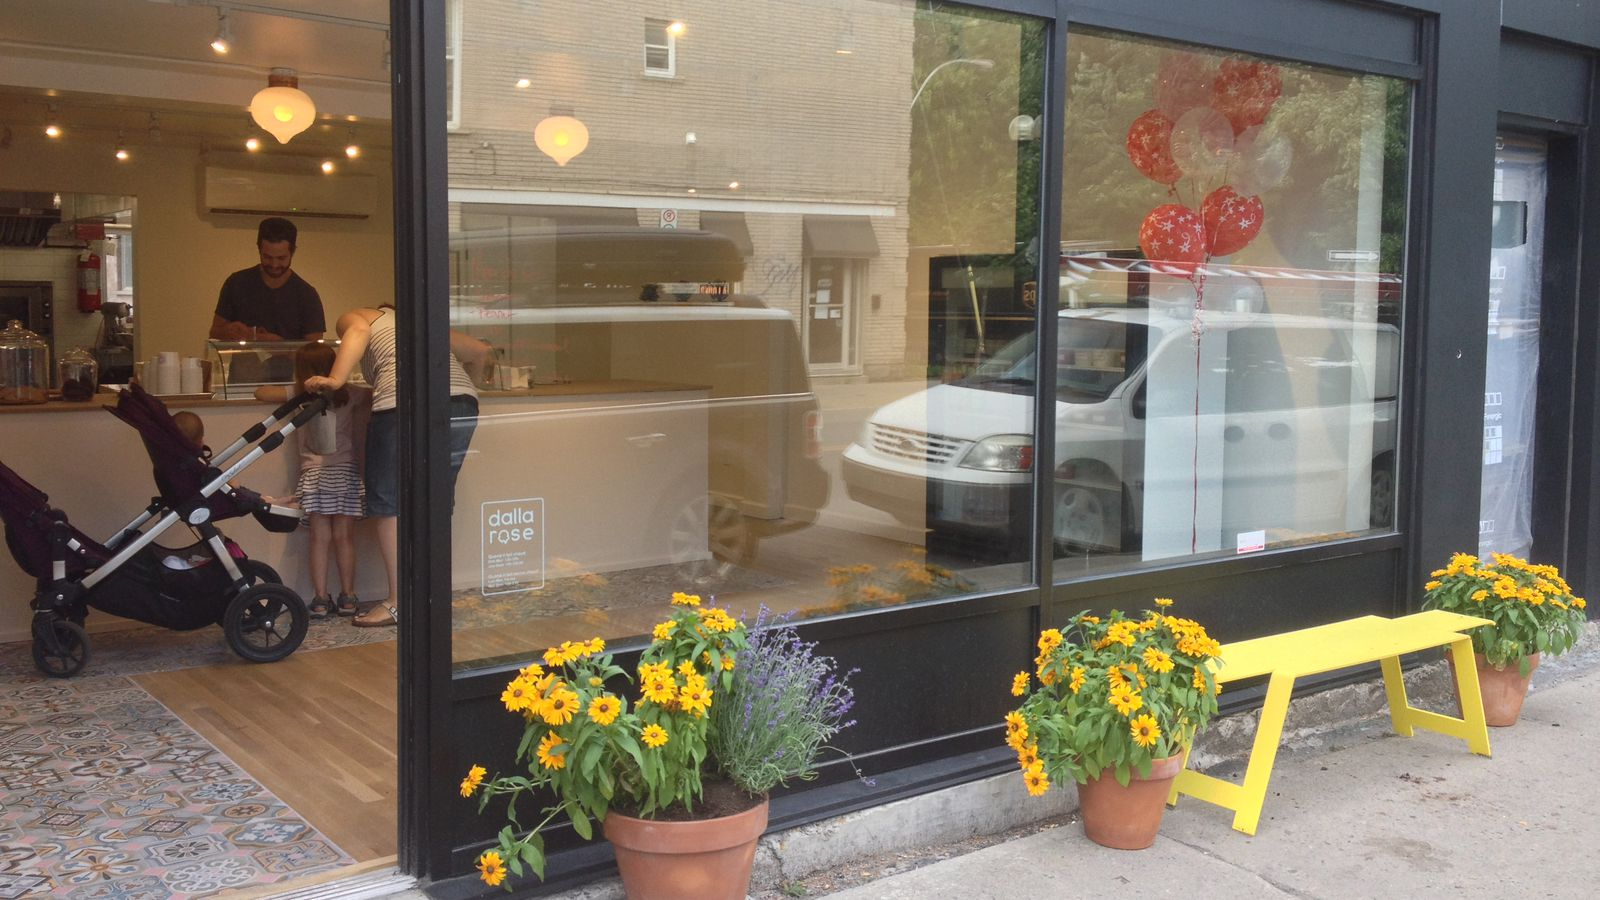 Nora Gray Vets Open Dalla Rose Creamery Eater Montreal